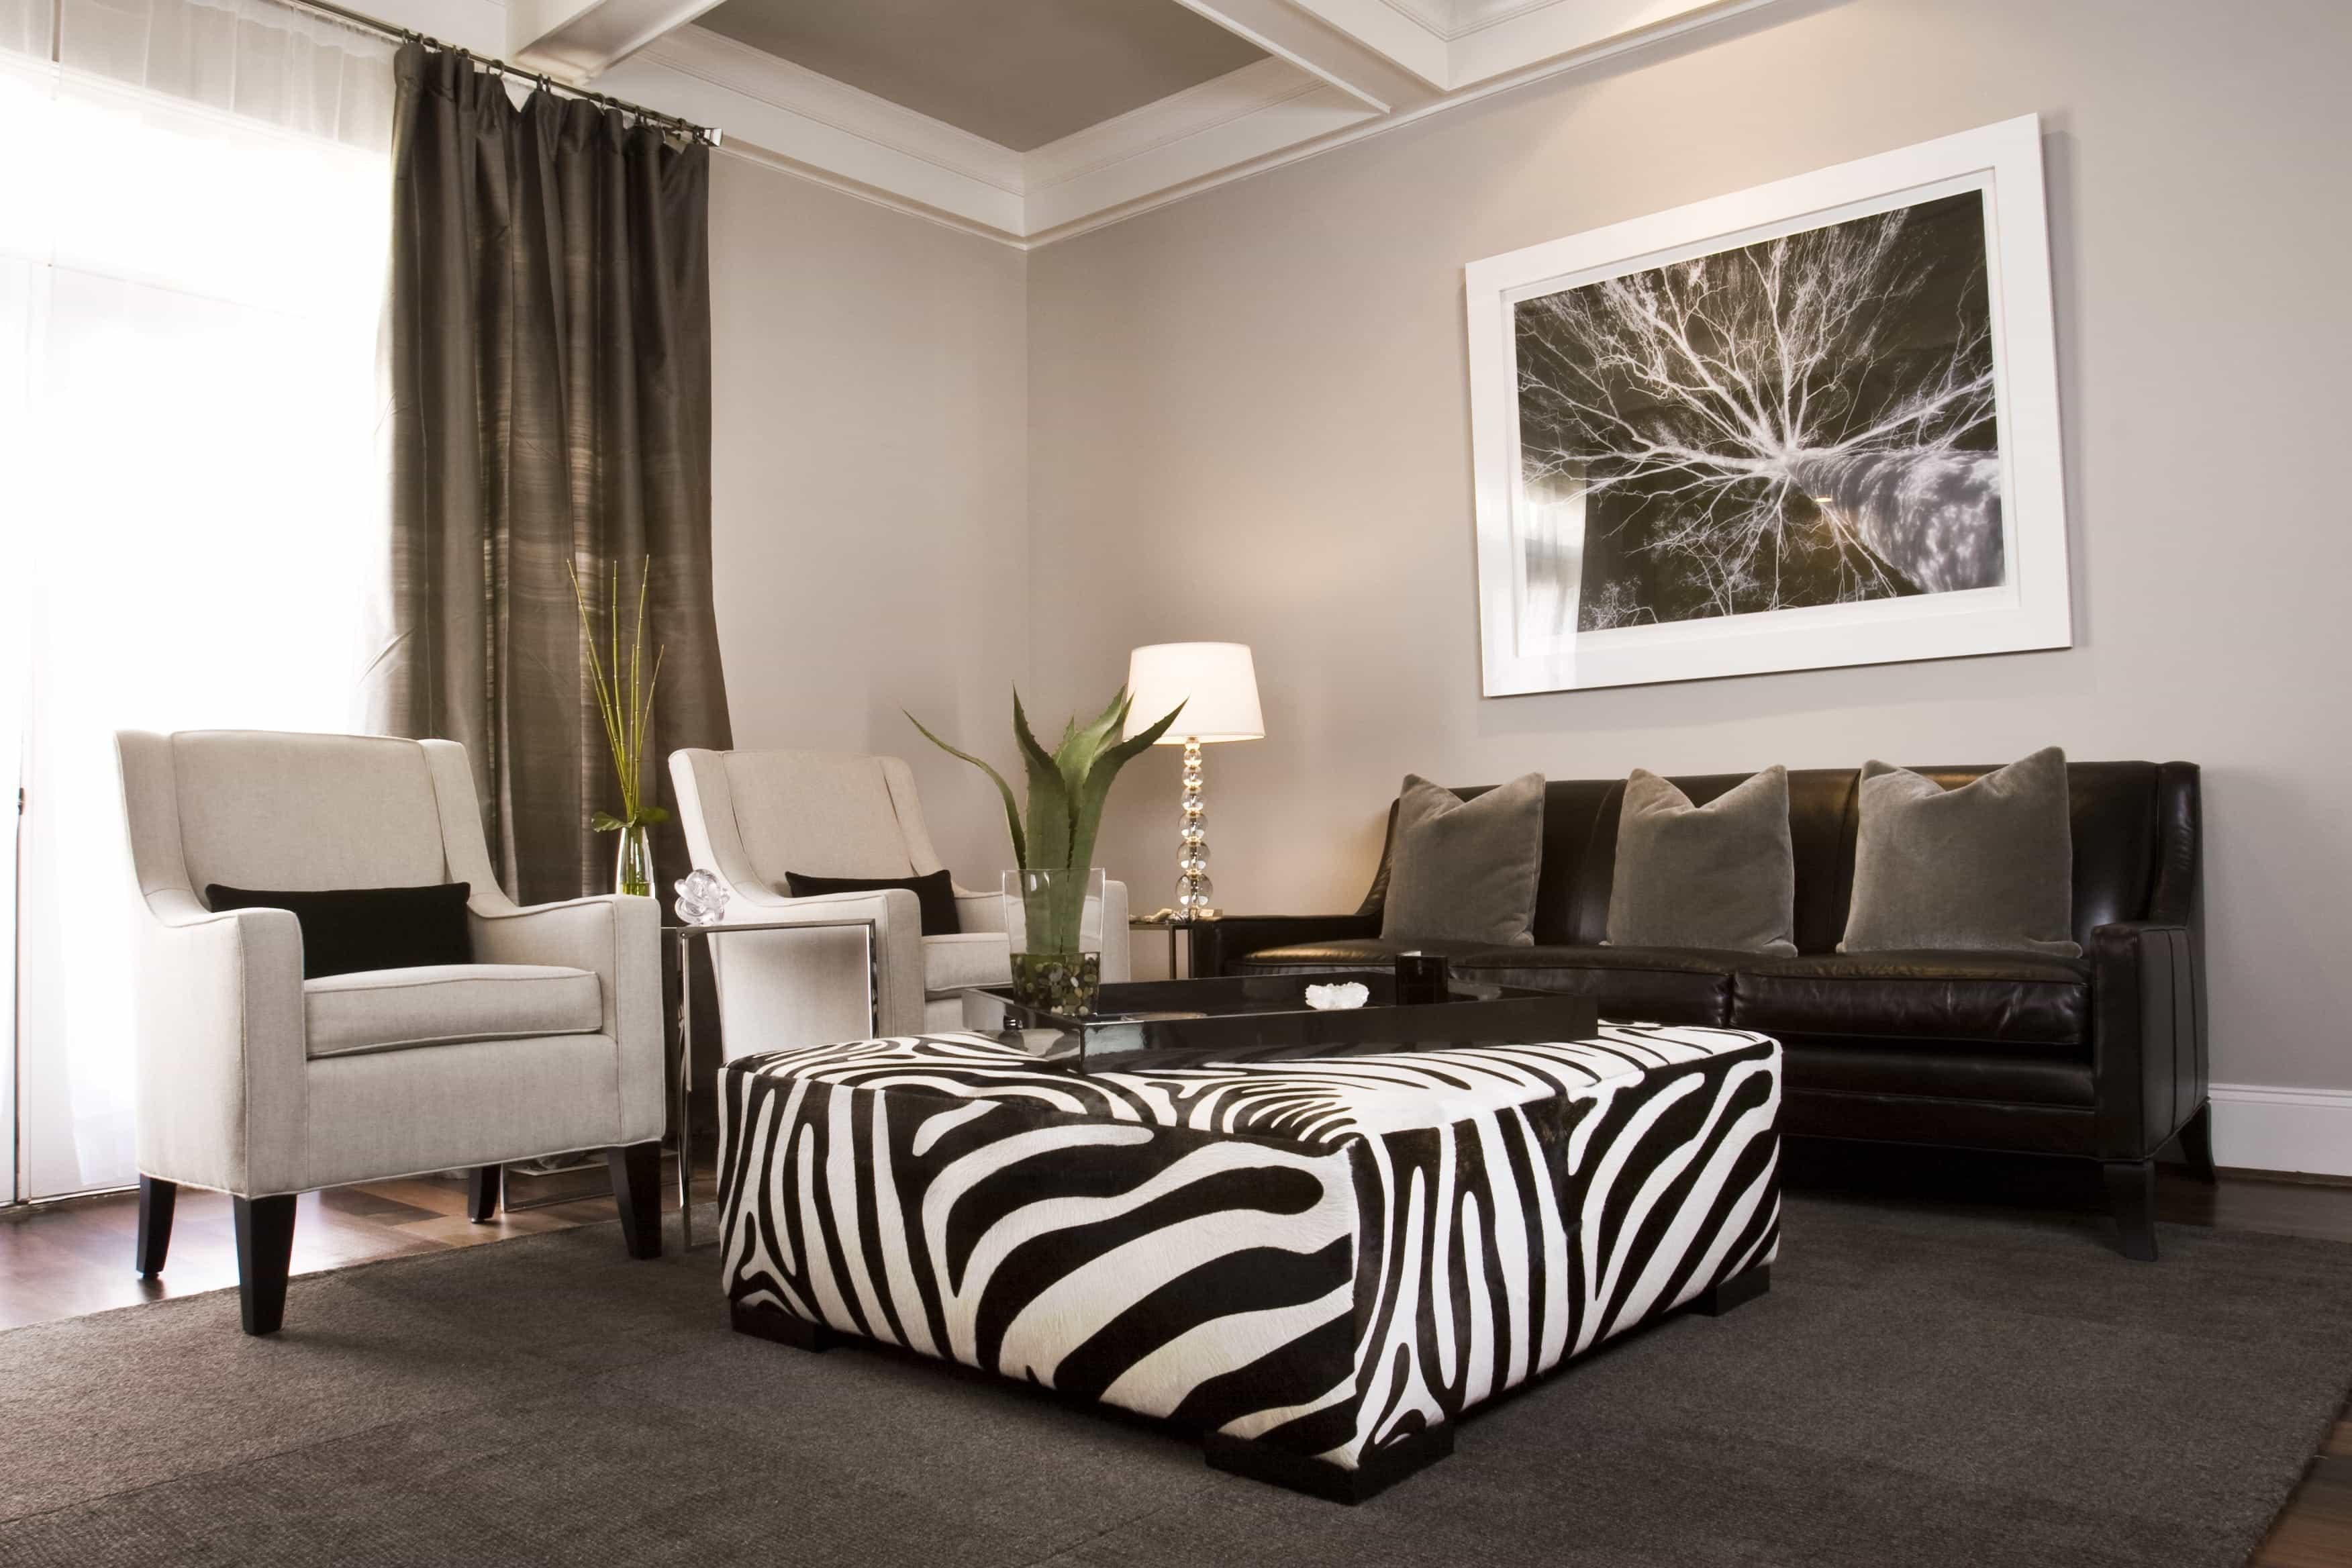 Fullsize Of Pictures Of Elegant Living Rooms